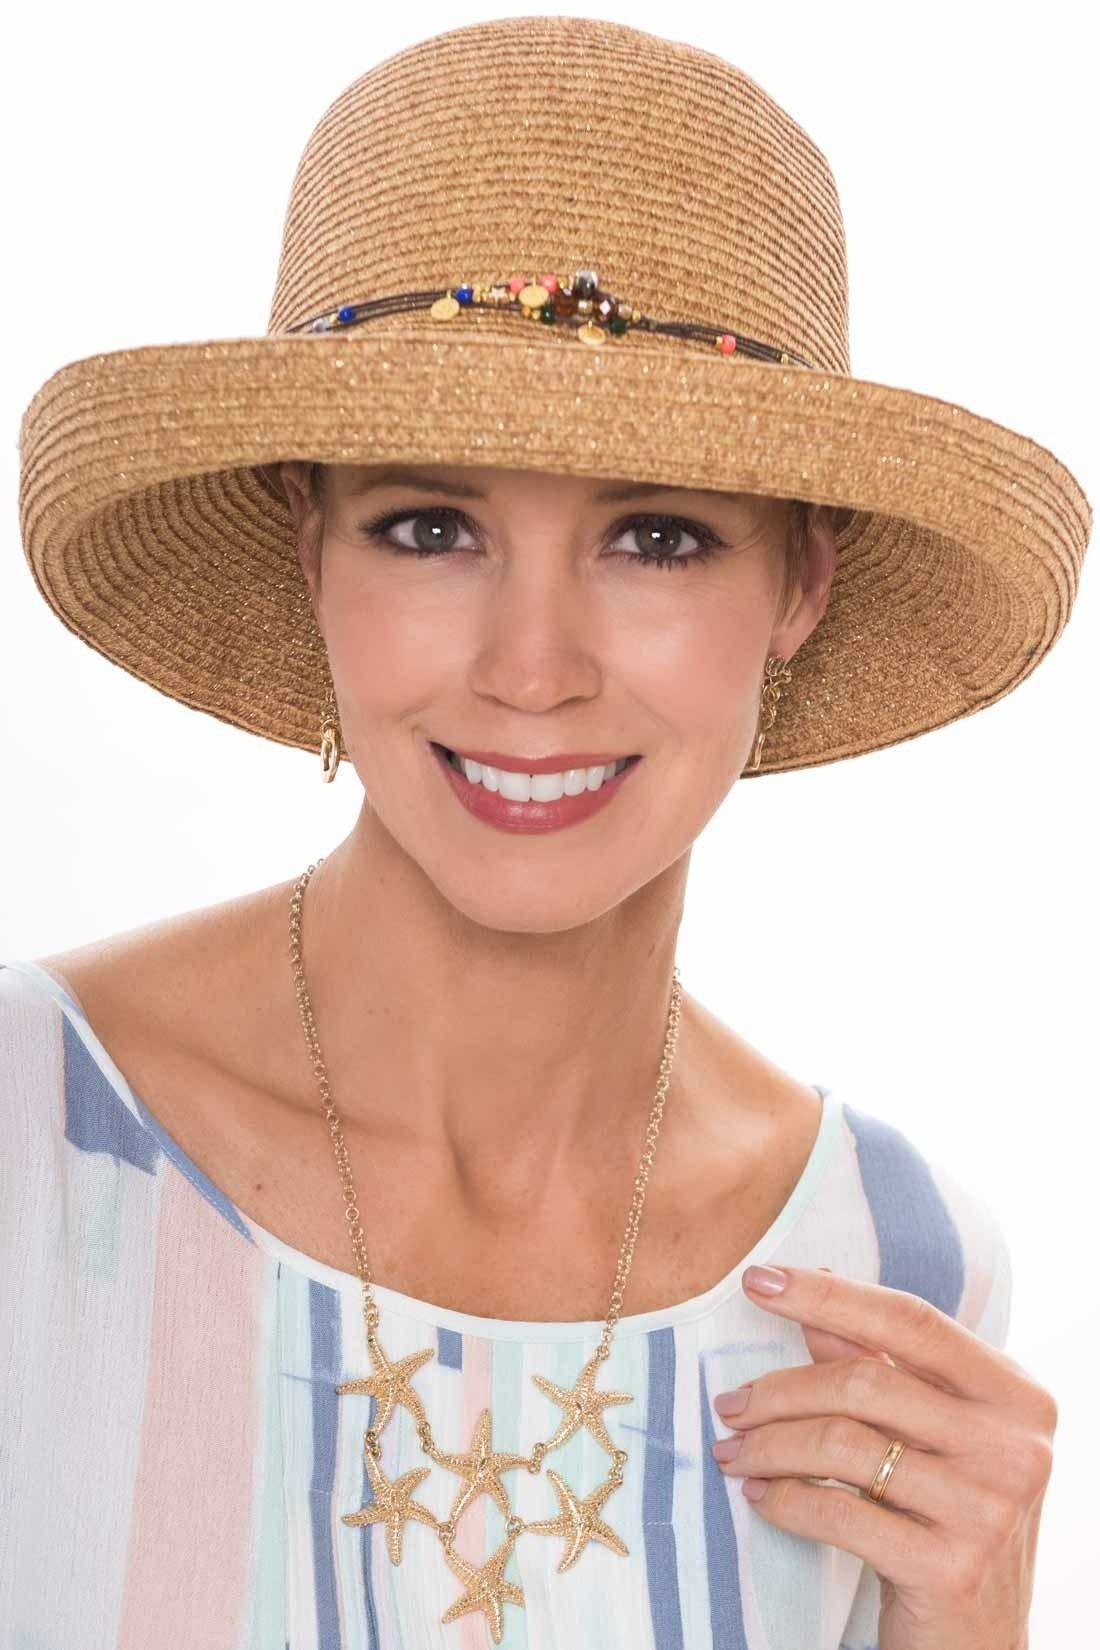 e35a8c9f83a3c Marisol Metallic Beaded Sun Hat. Provides full coverage